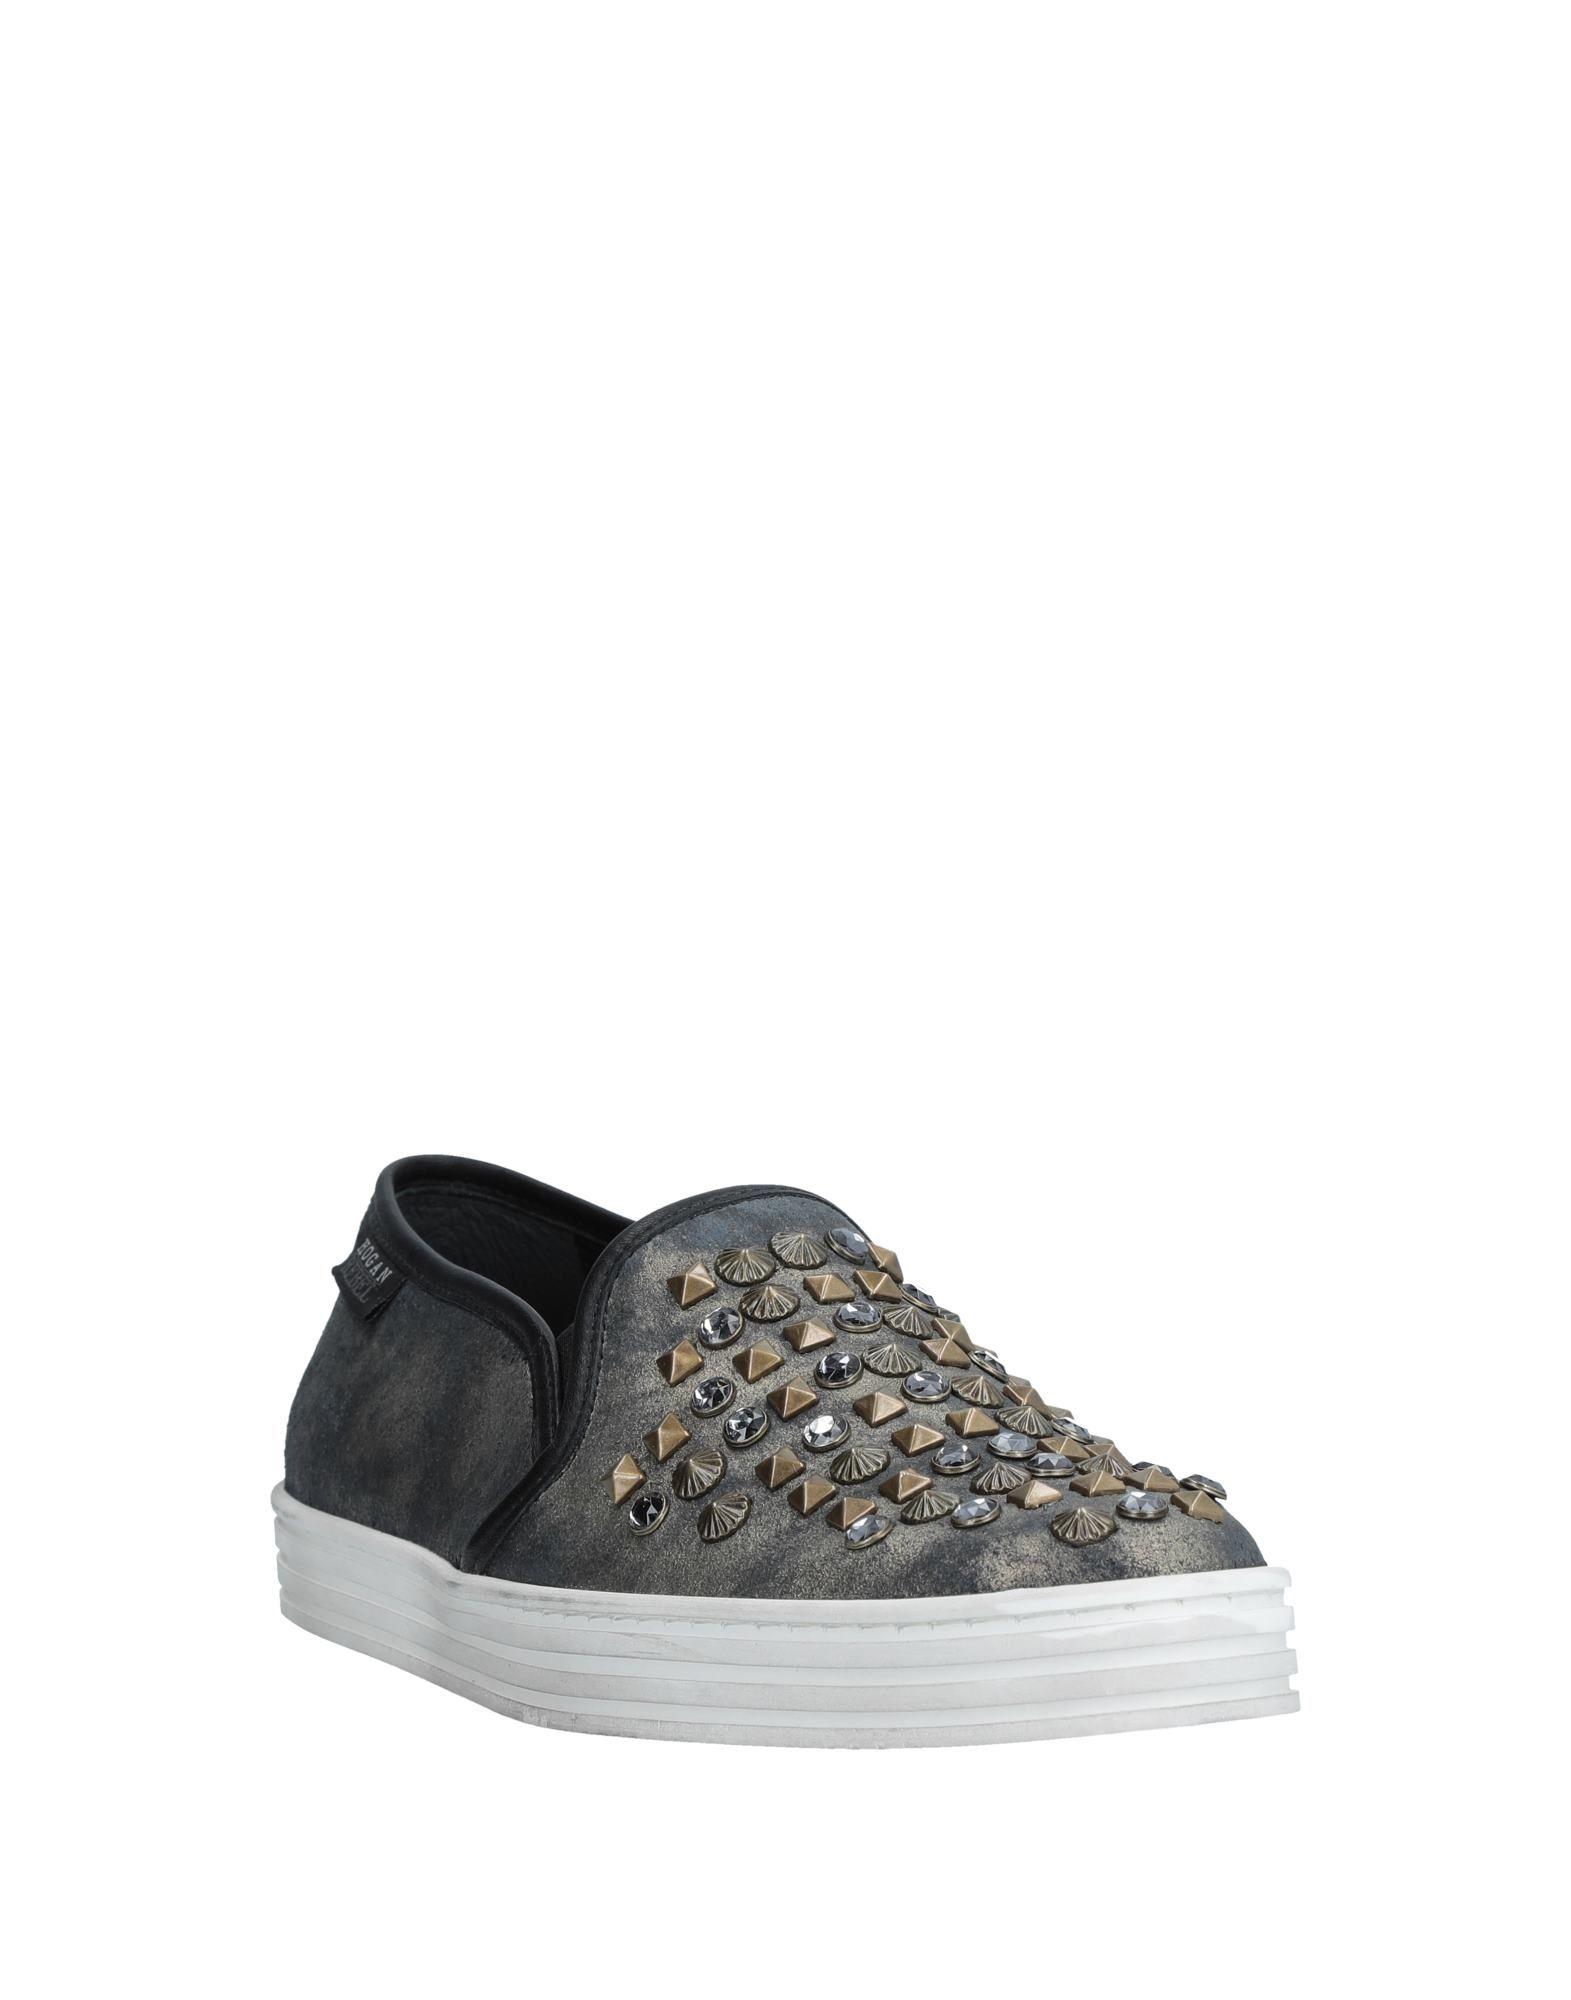 Hogan Rebel Sneakers Sneakers Rebel Damen  11541631RC Neue Schuhe 0c3744